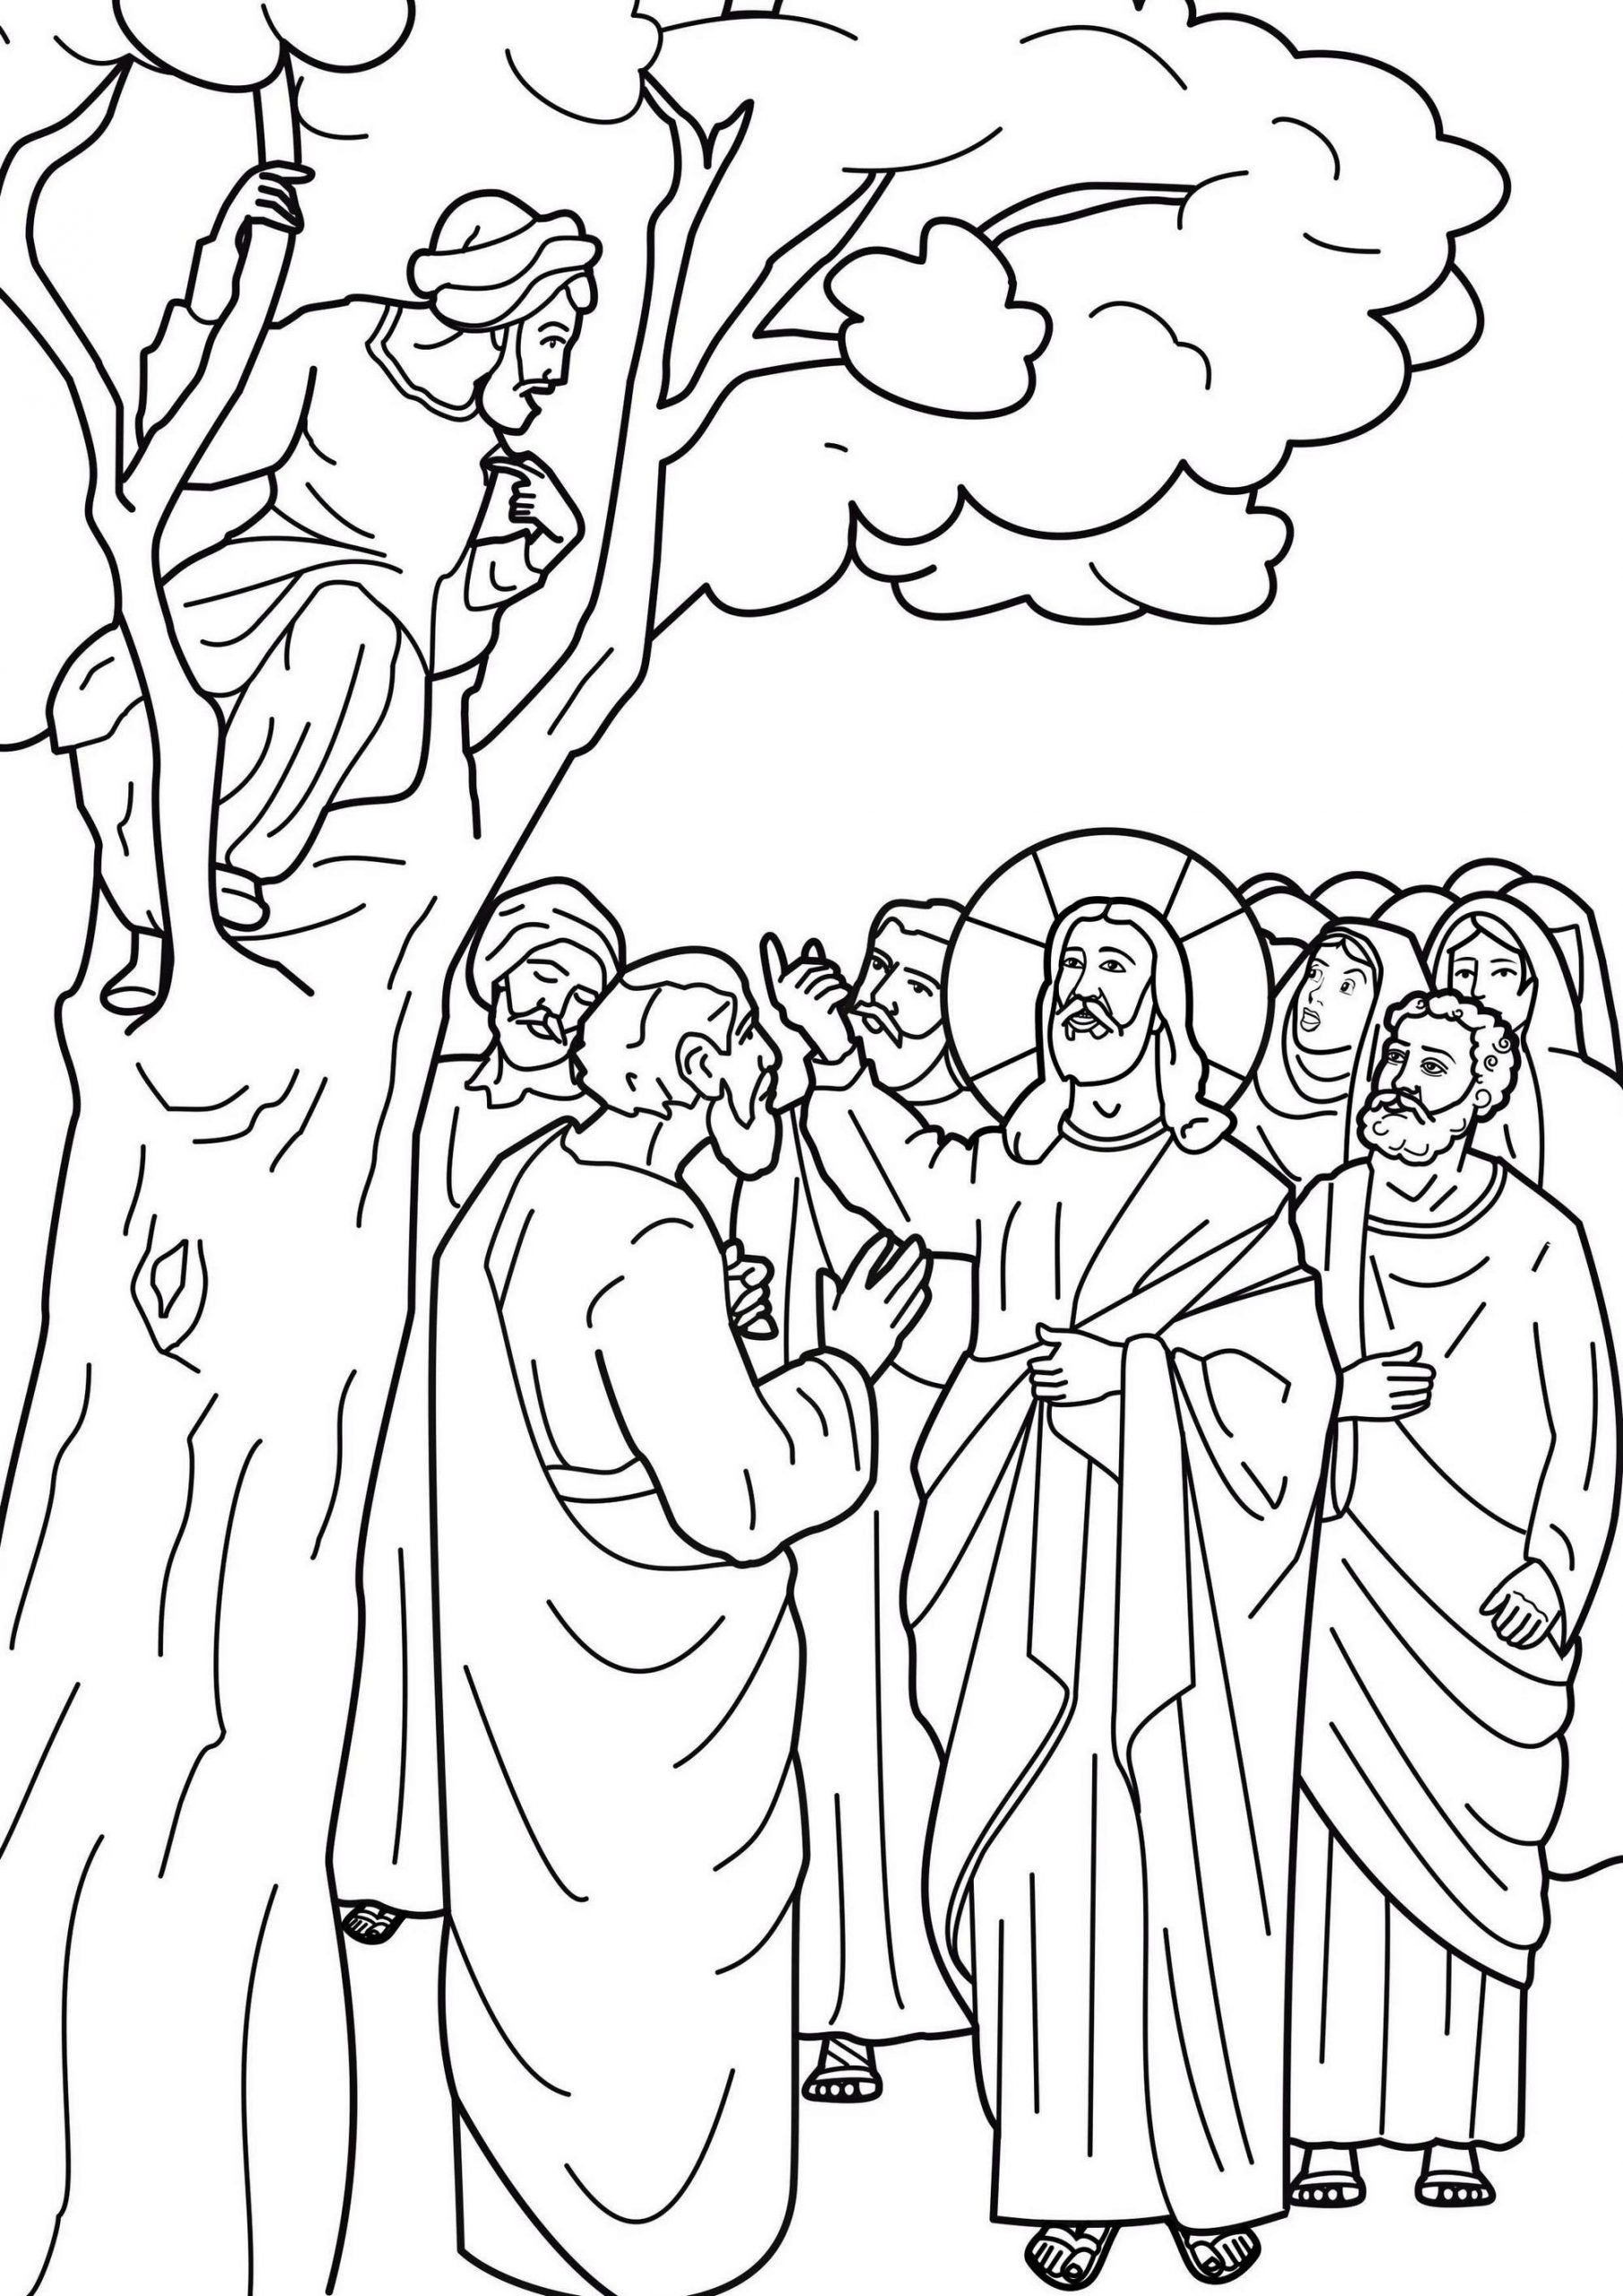 Zacchaeus Coloring Pages For Preschoolers Zacchaeus Coloring Page At Getdrawings Love Coloring Pages Zacchaeus Bible Coloring Pages